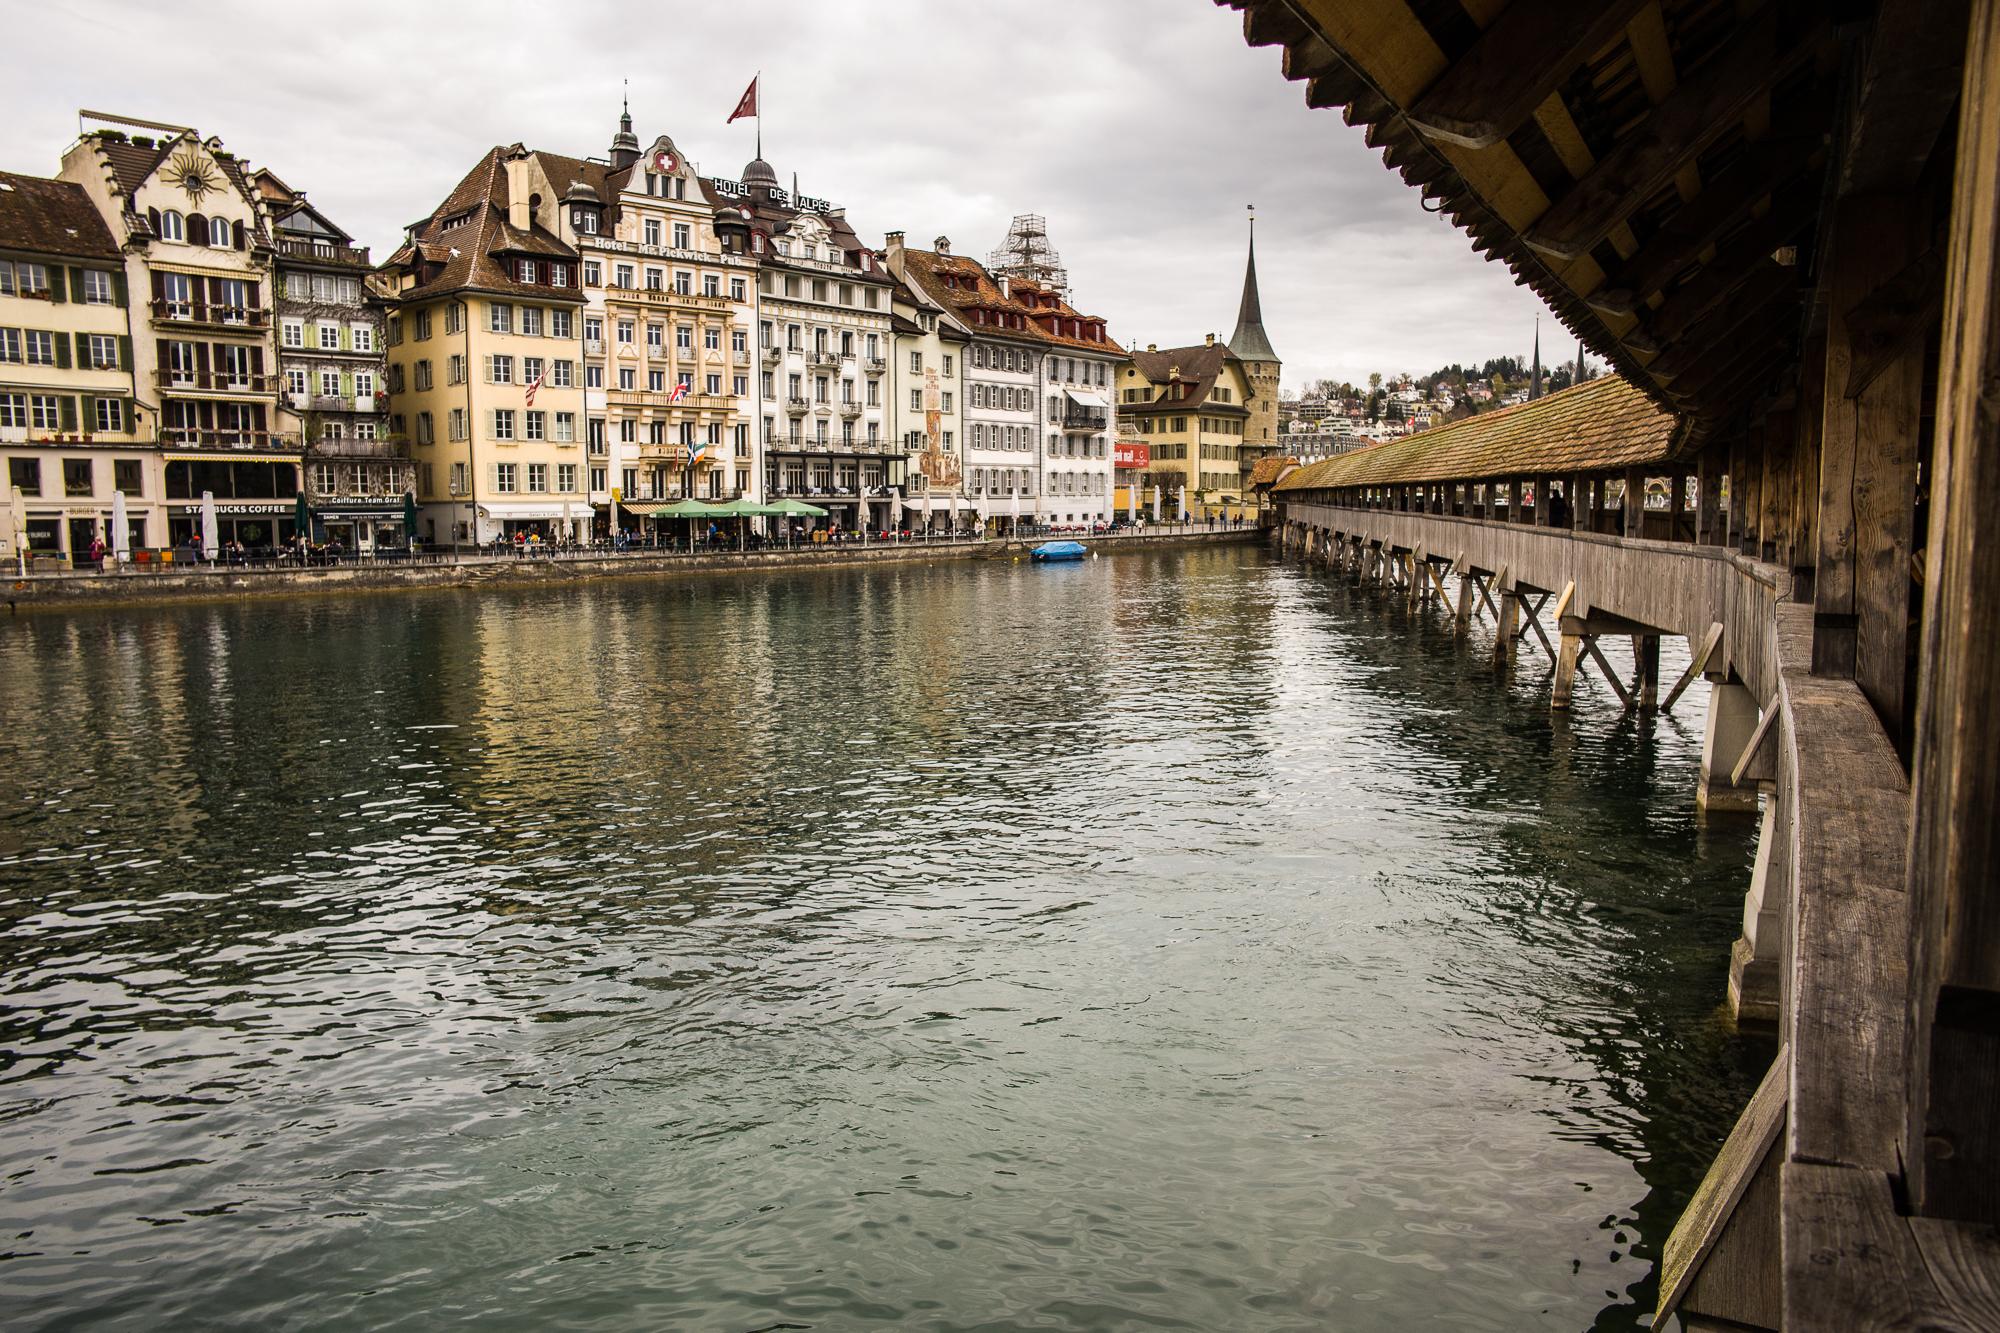 The Kapellbrücke bridge in Lucerne built in 1333